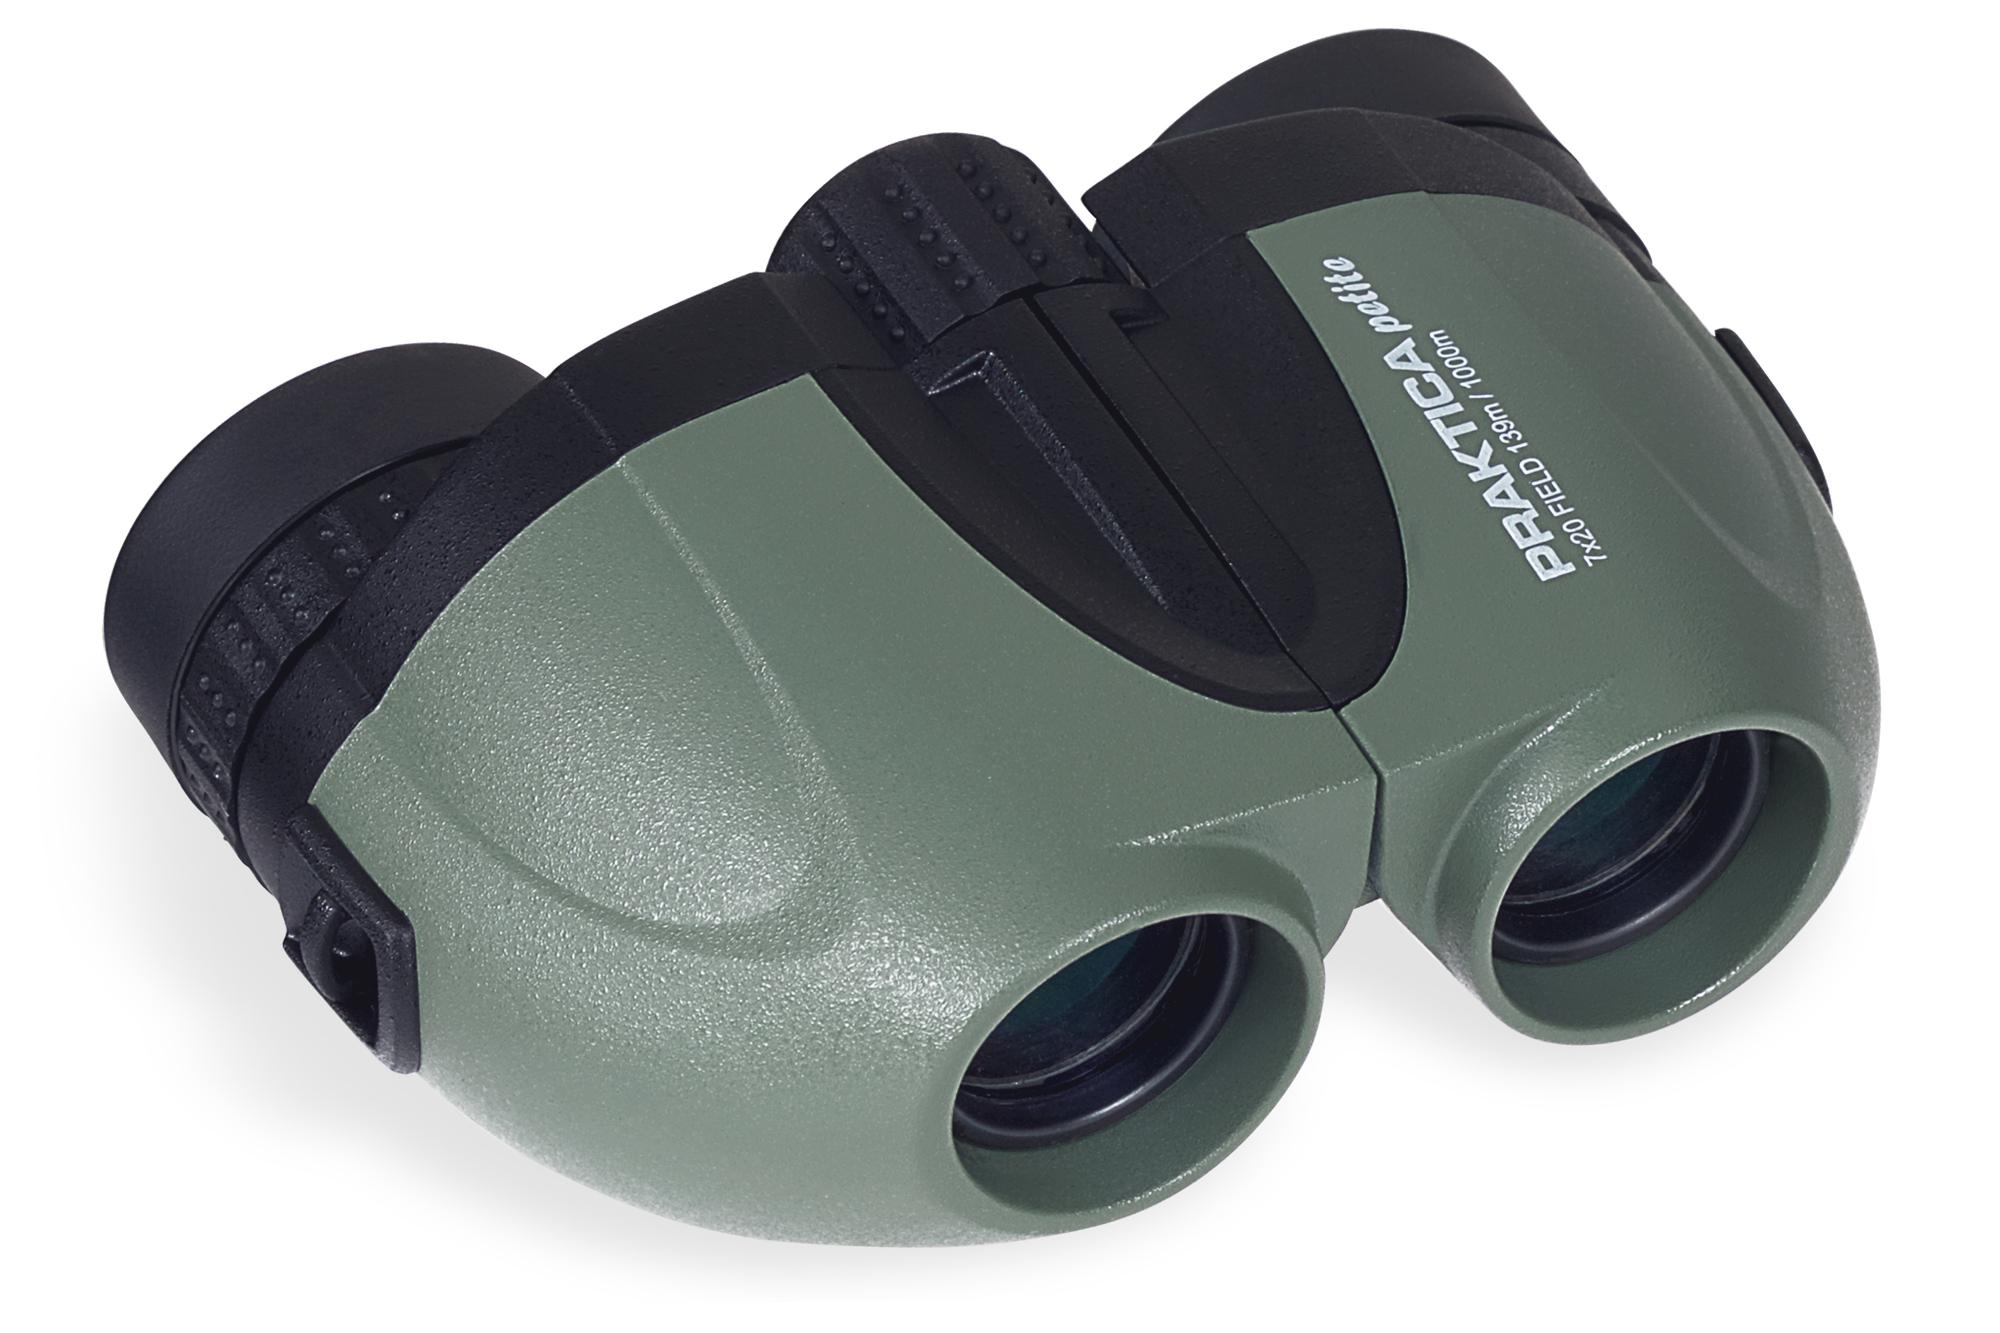 Praktica petite mm binoculars green u g £ london